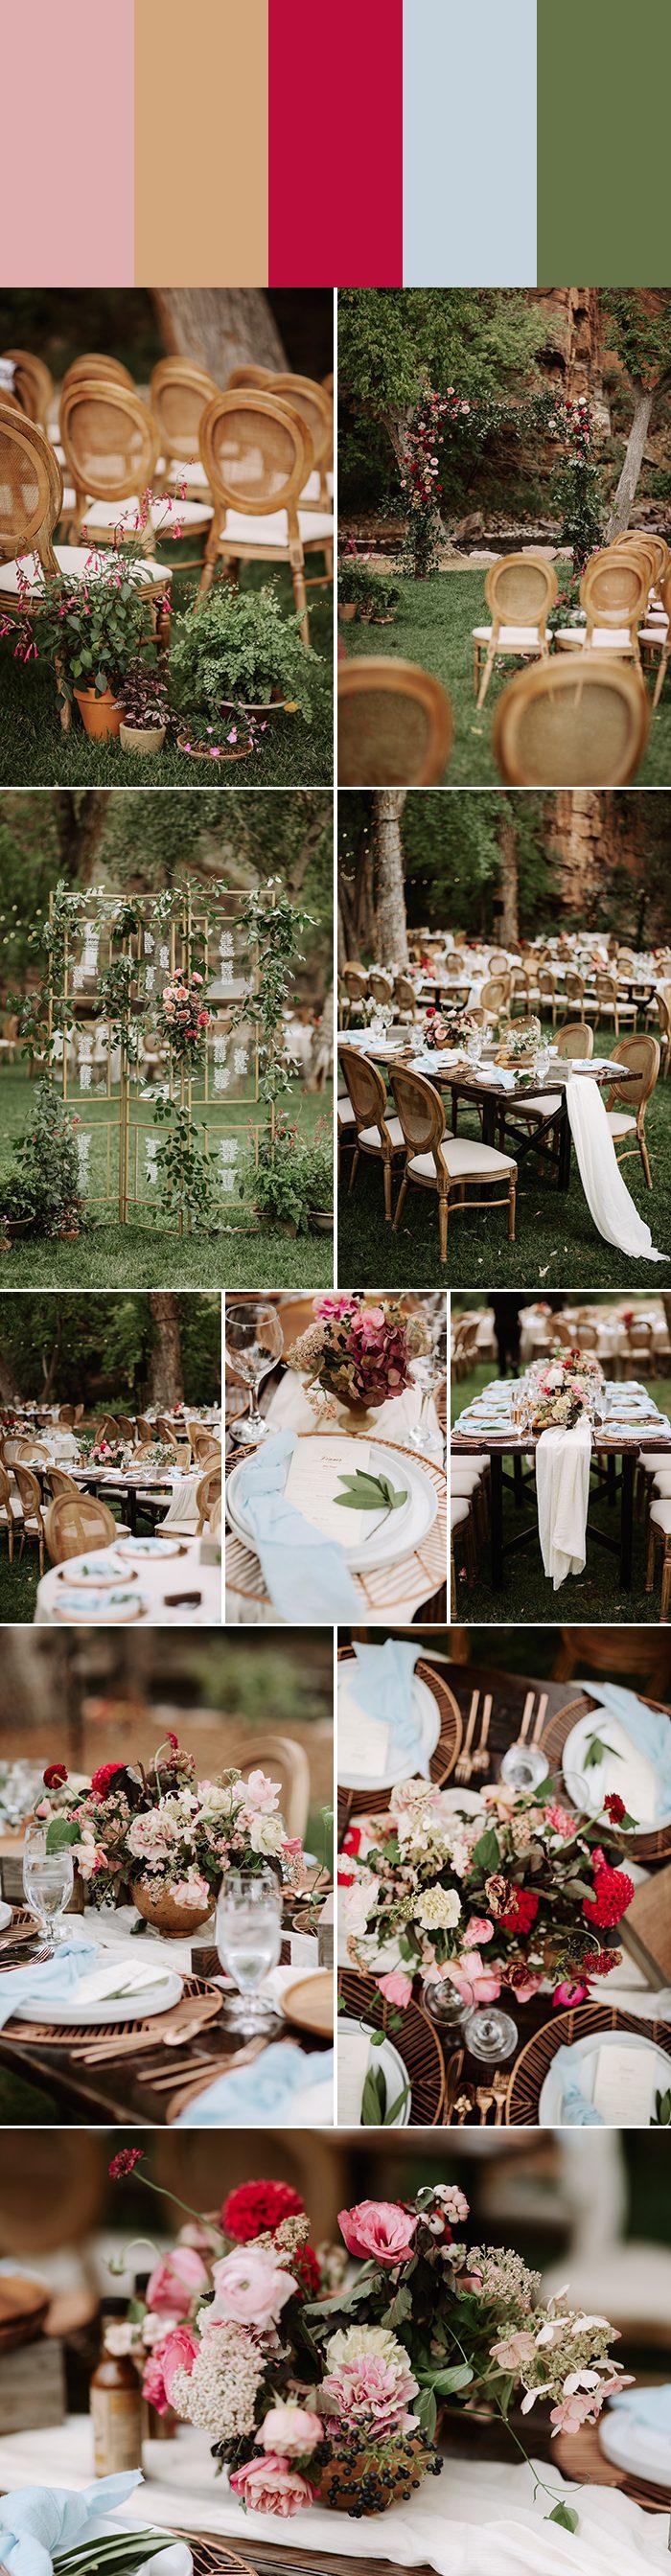 Spring Wedding Colors.5 Inspiring Spring Wedding Color Palette Ideas Junebug Weddings